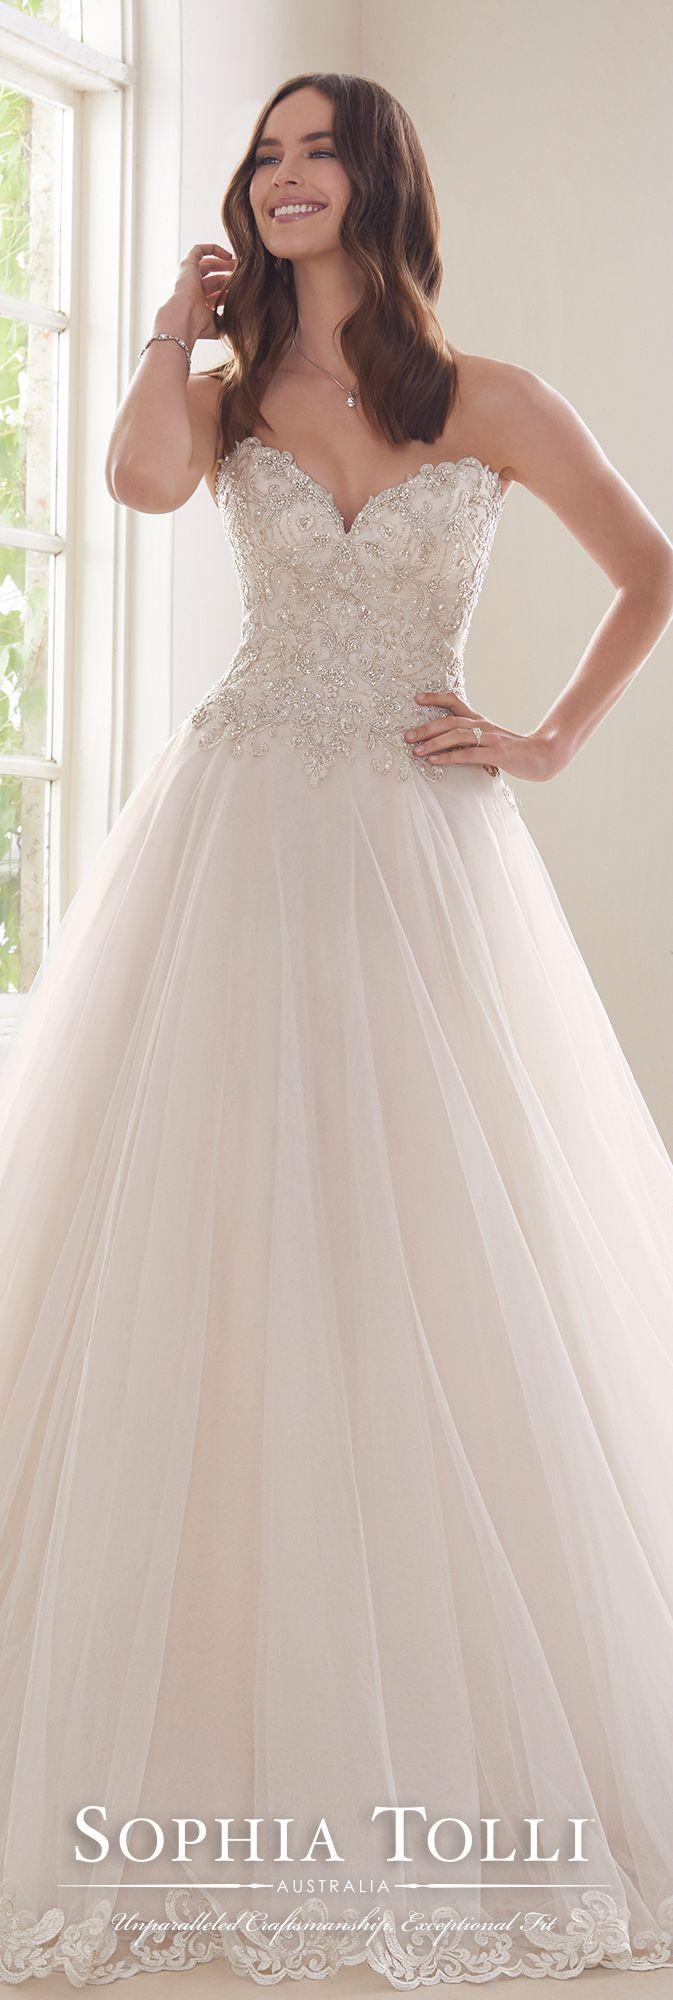 Strapless Sweetheart u Misty Tulle Ballgown Wedding Dress  Wedding